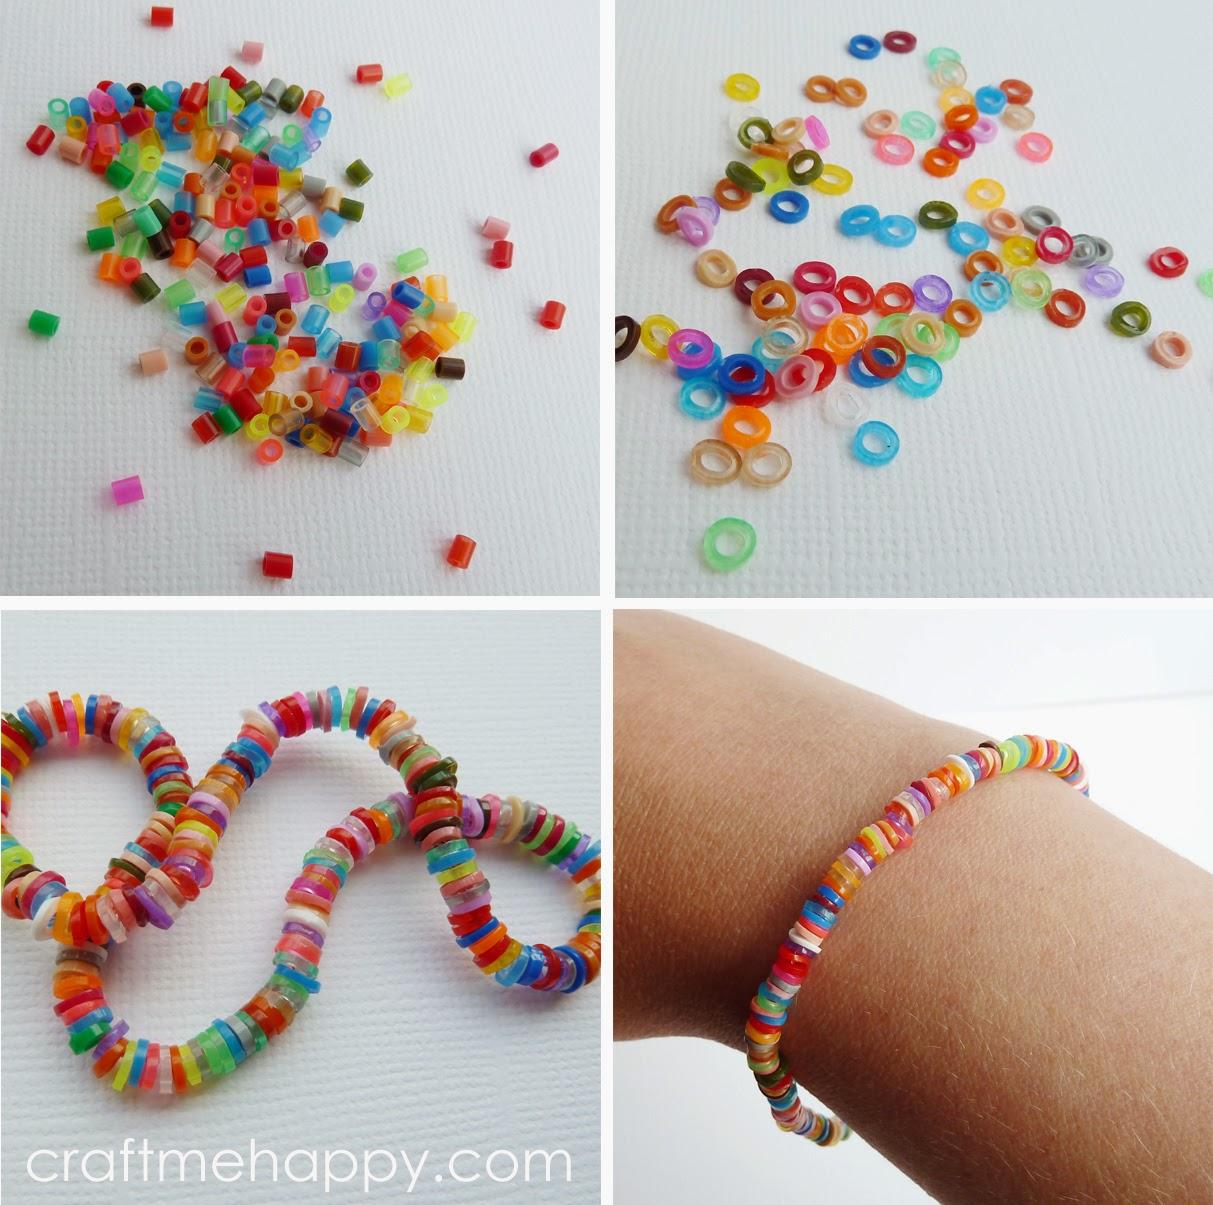 http://www.craftmehappy.com/2012/08/melting-mini-hama-beads.html